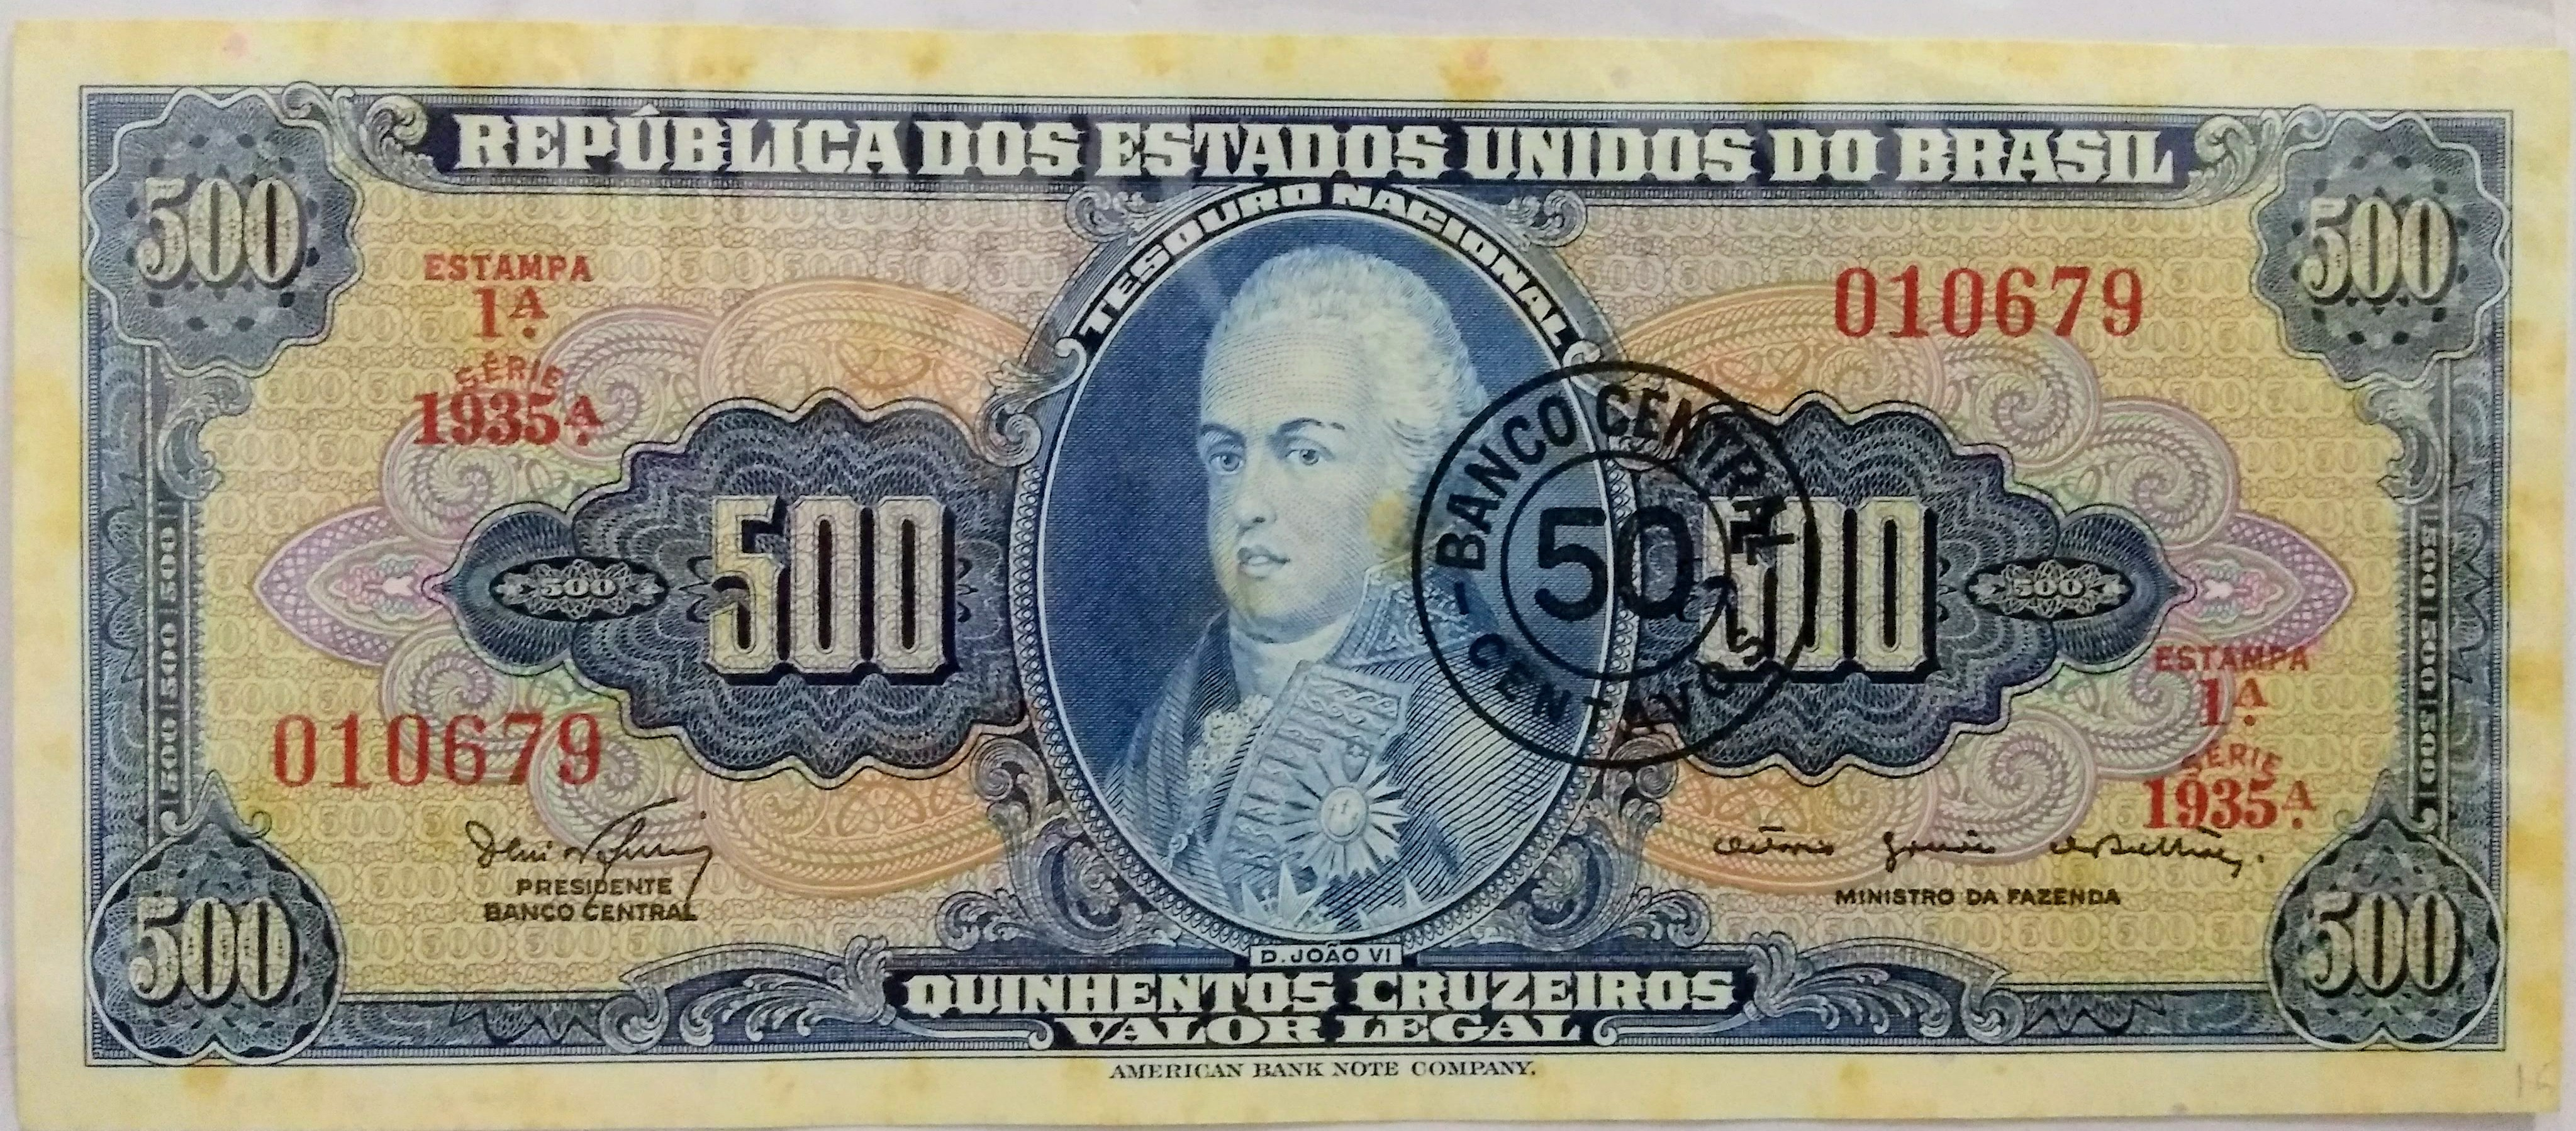 50 CENTAVOS - CARIMBO CRUZEIRO NOVO